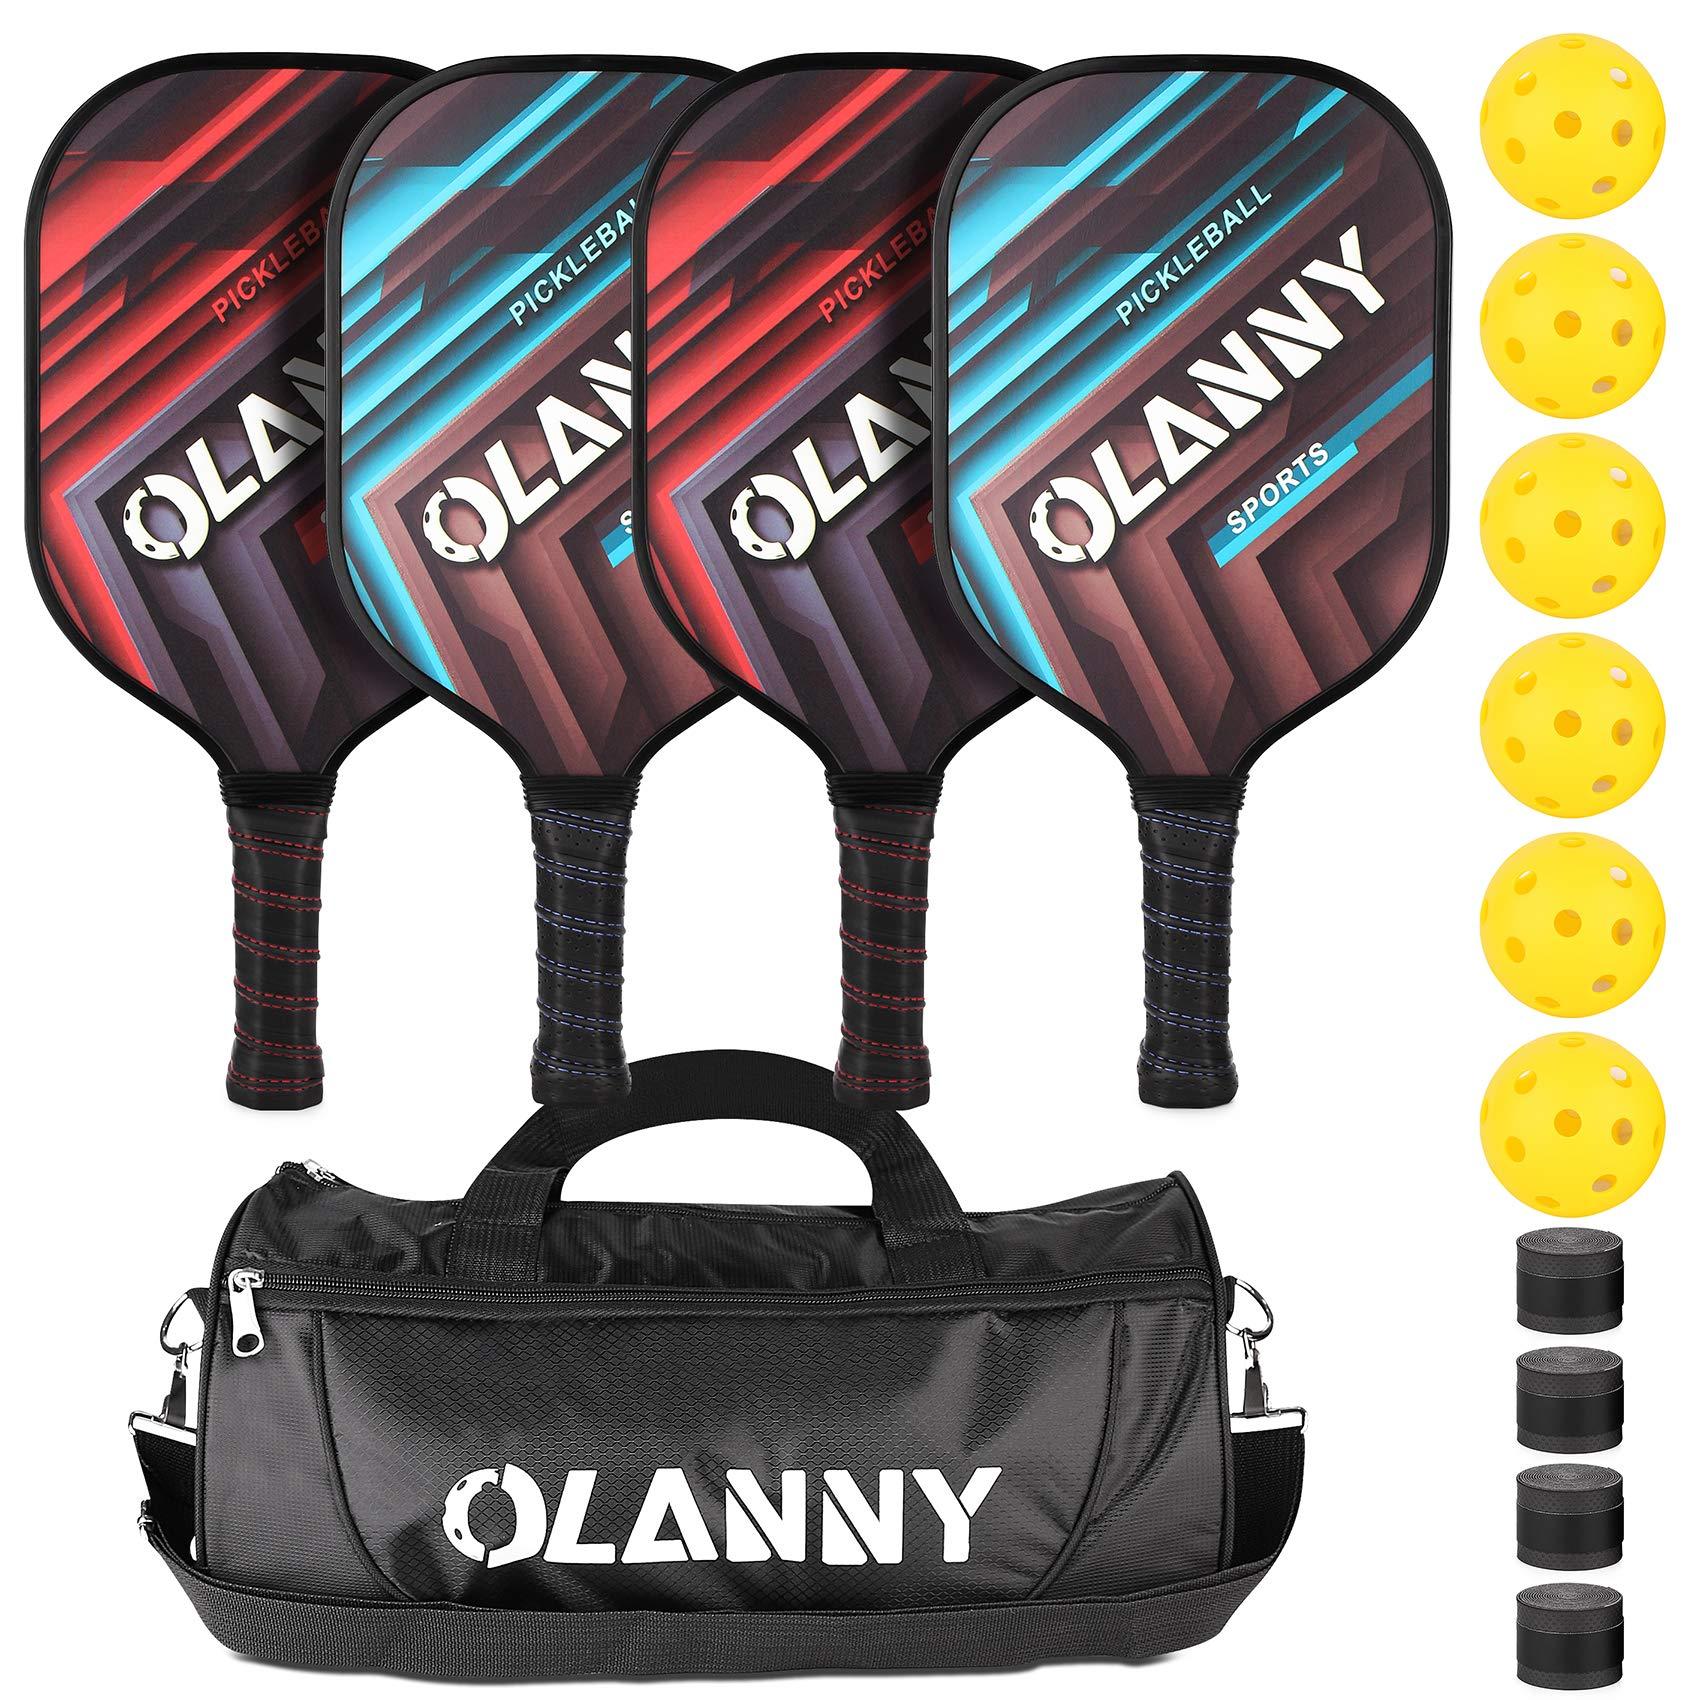 OLANNY Graphite Pickleball Paddles 4 Pack - Premium Rackets